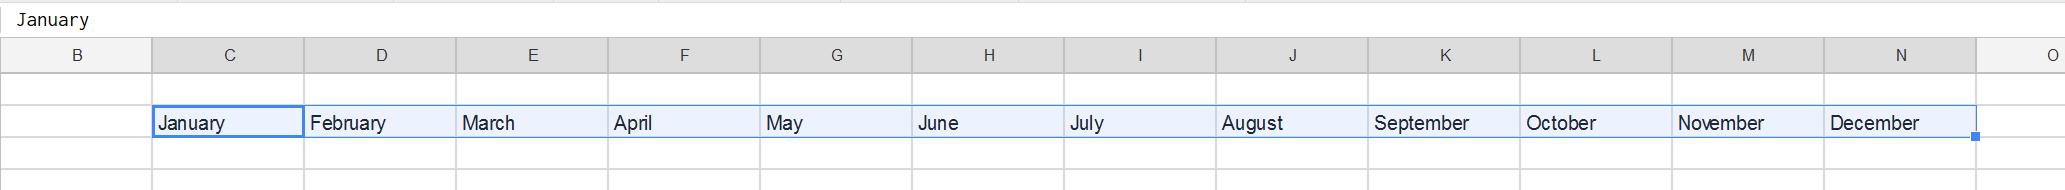 Building the calendar - 02